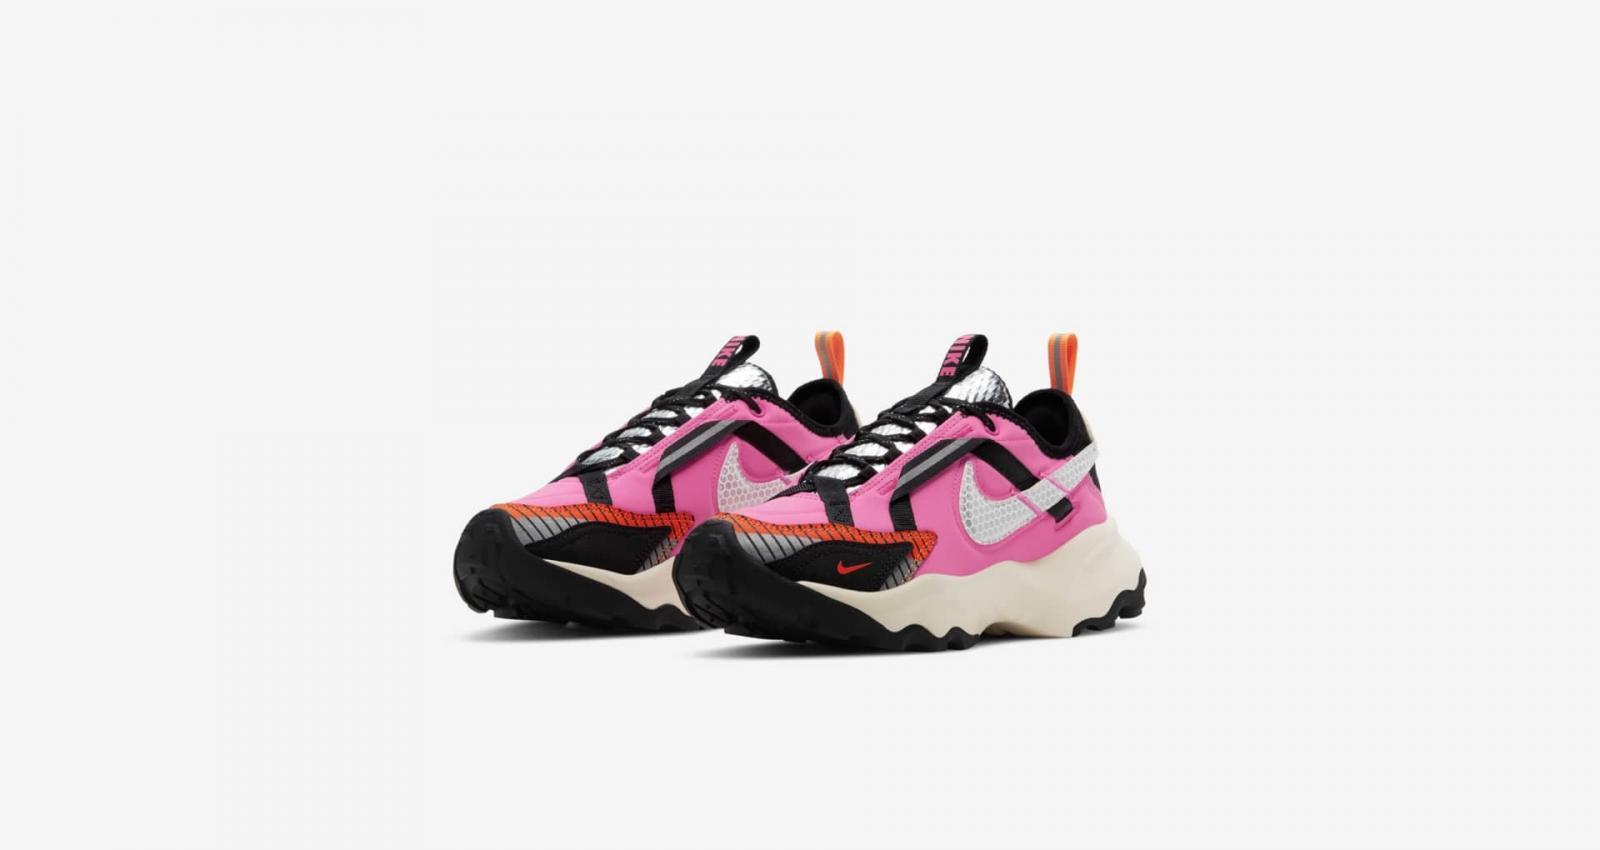 Nike Sportswear发布全新爆炸粉色WMNS TC 7900 LX